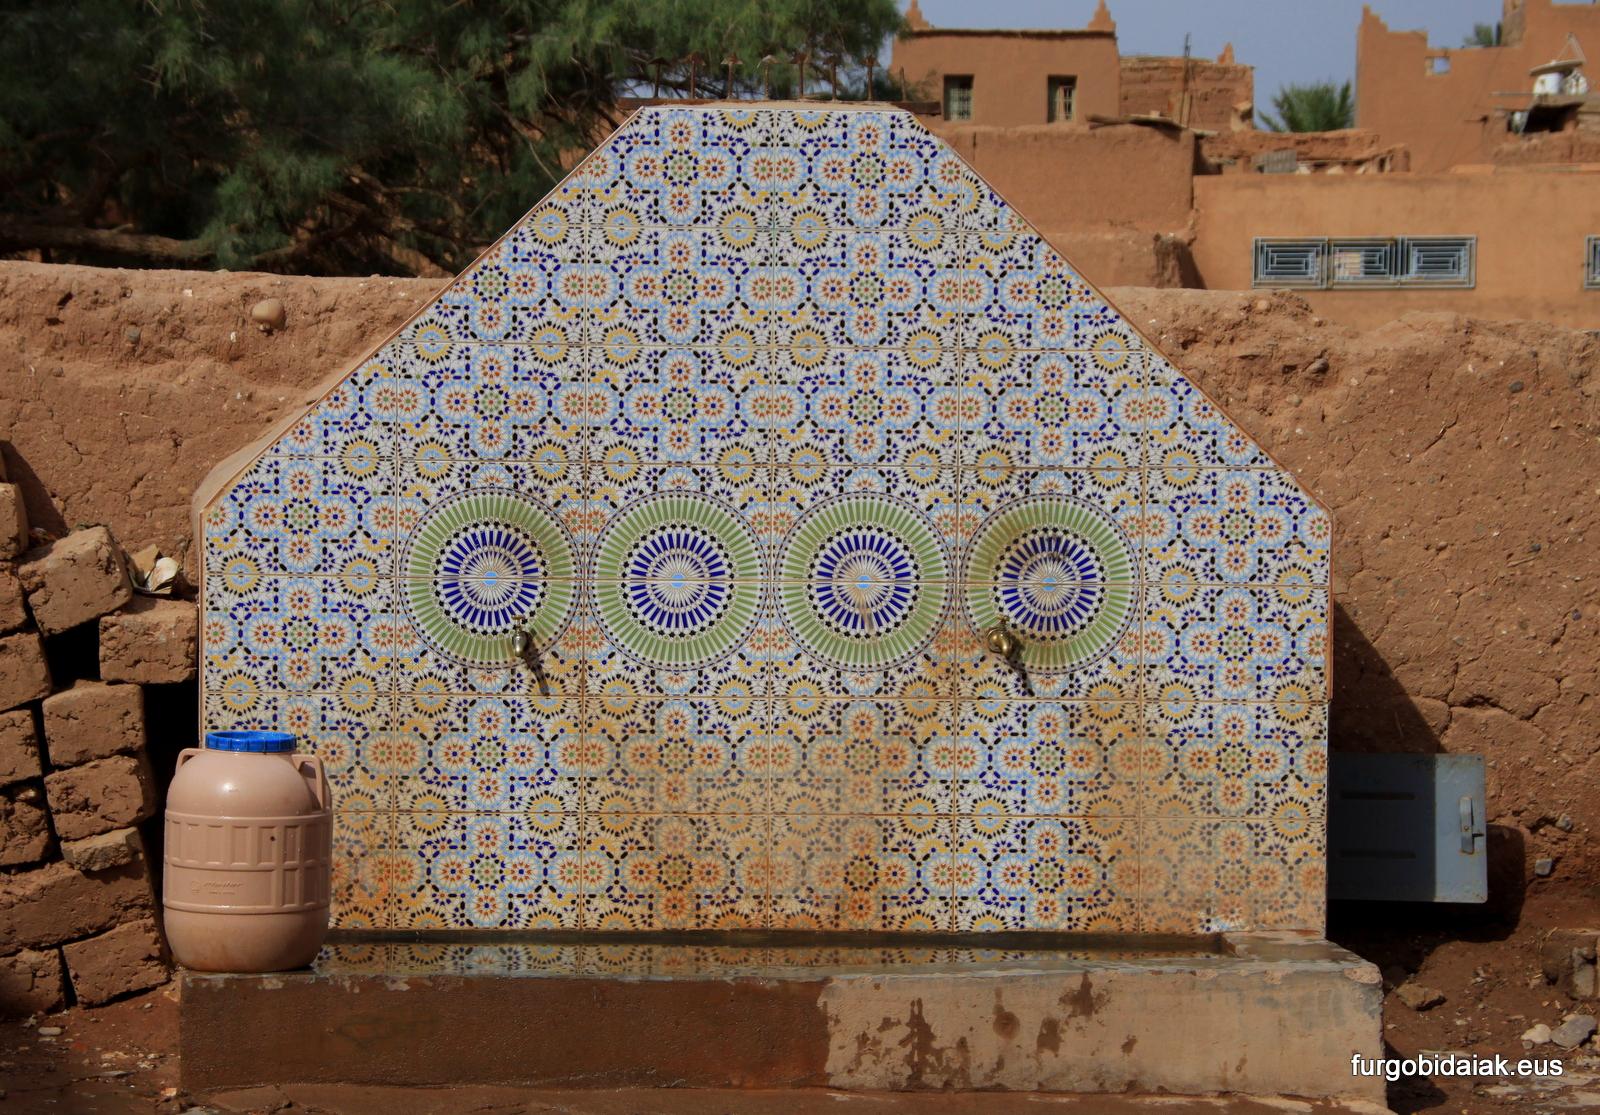 El agua, consejos para viajar a Marruecos